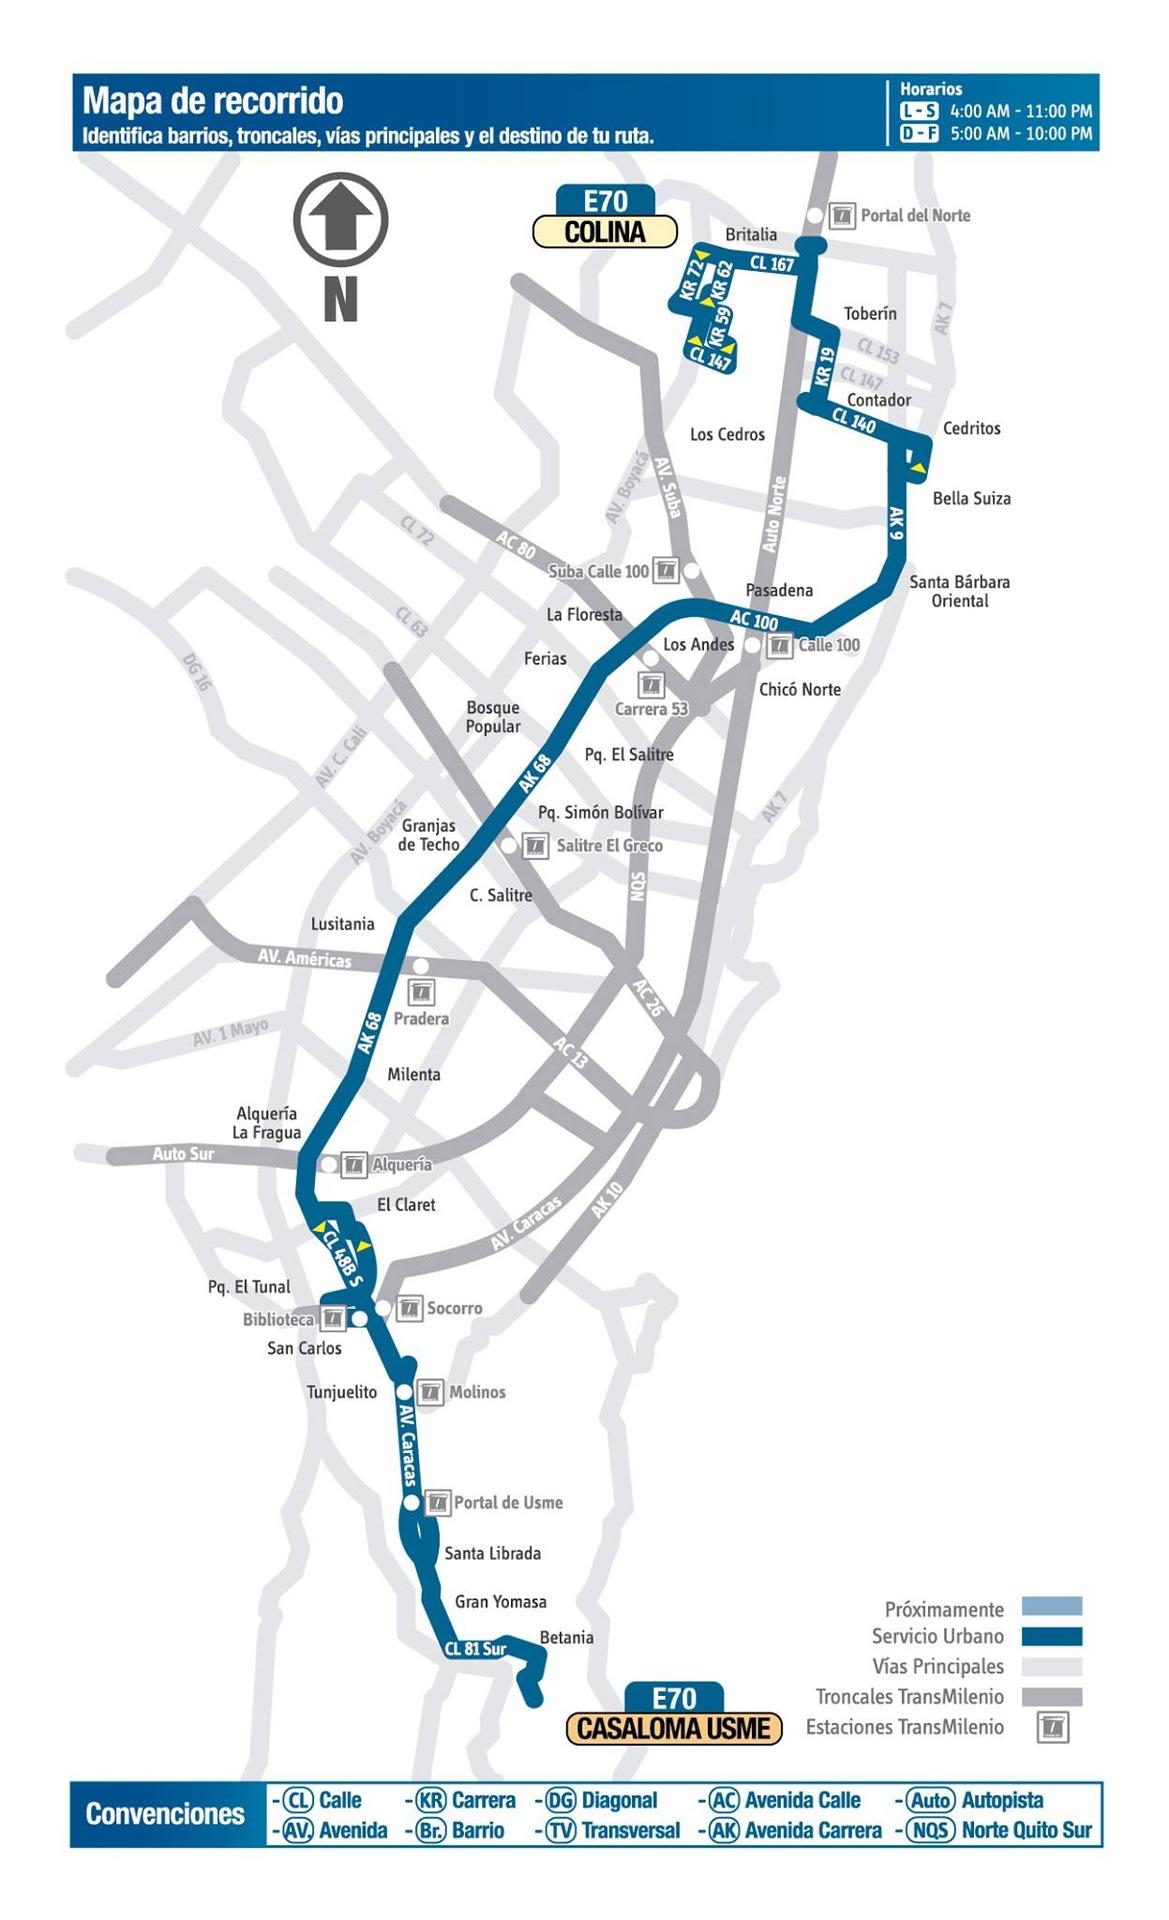 Ruta SITP: E70 Casaloma ↔ Colina [Urbana] 1